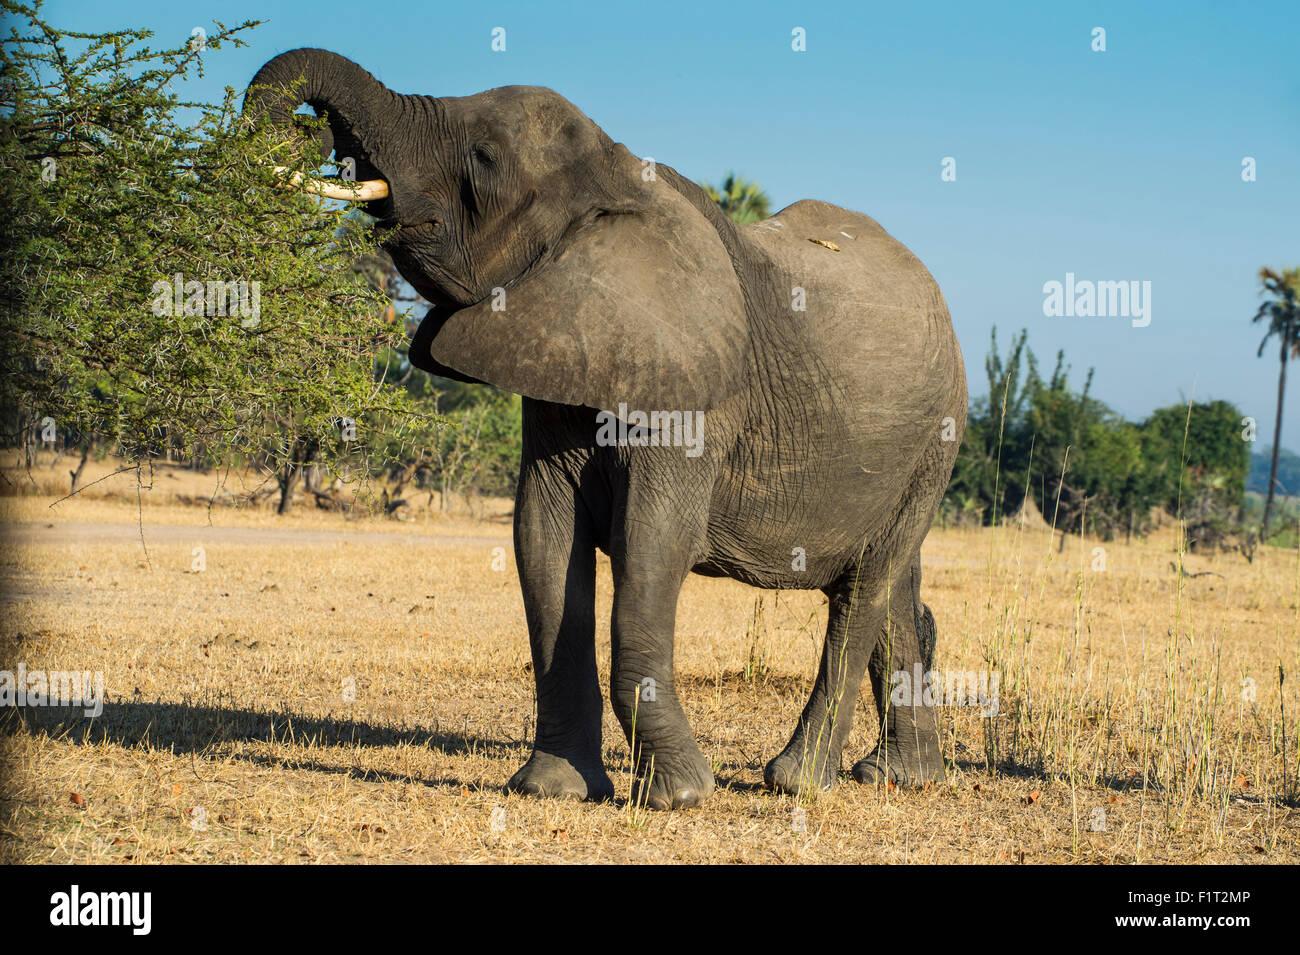 African bush elephant (Loxodonta africana) eating from a tree, Liwonde National Park, Malawi, Africa - Stock Image